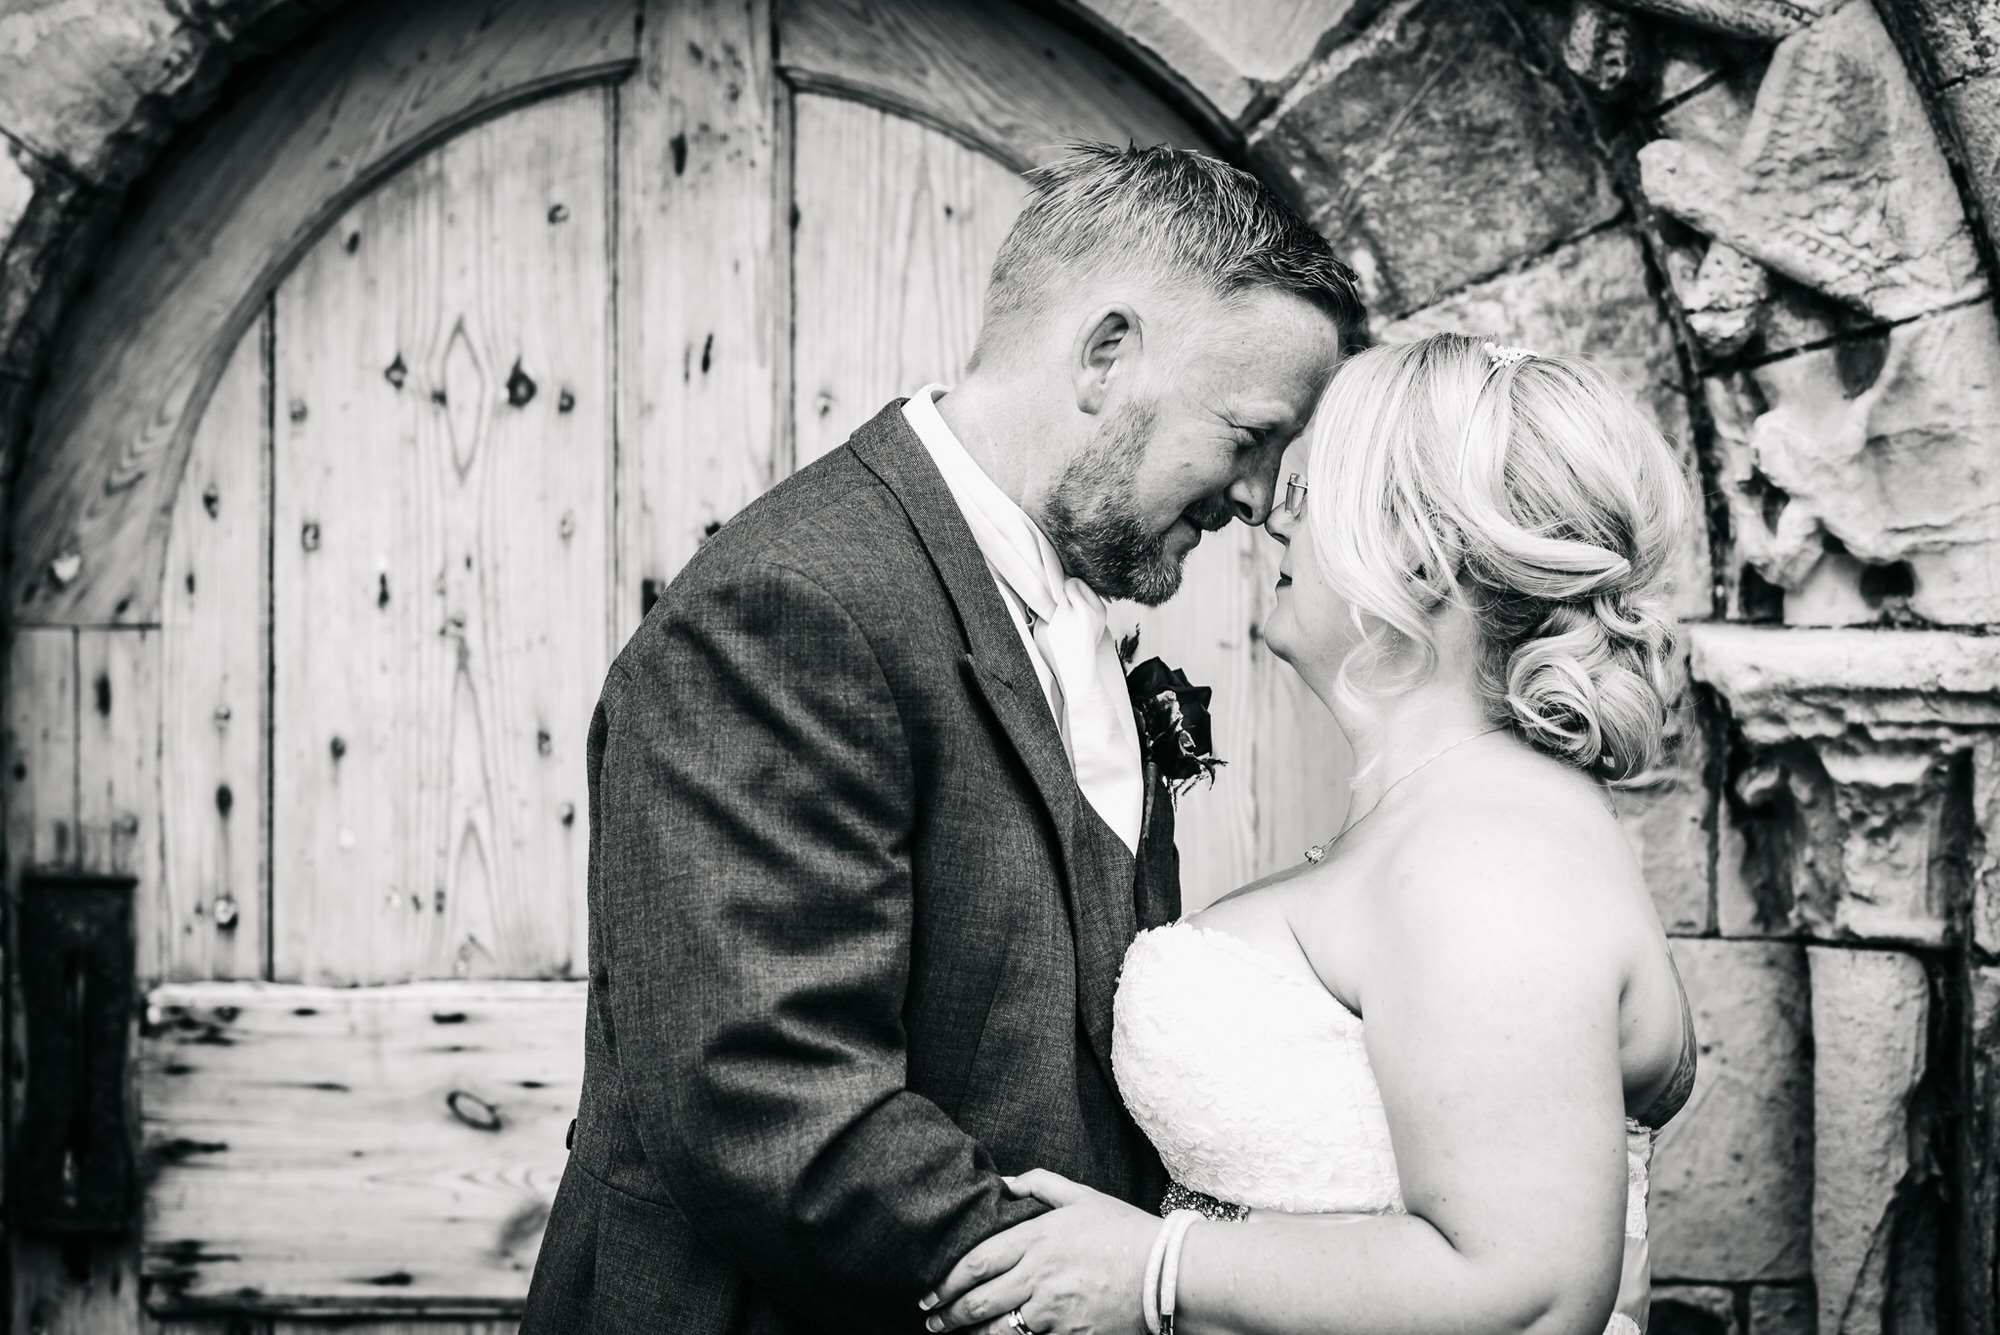 Best Of Yorkshire Wedding Photography 2017 - Martyn Hand-77.jpg